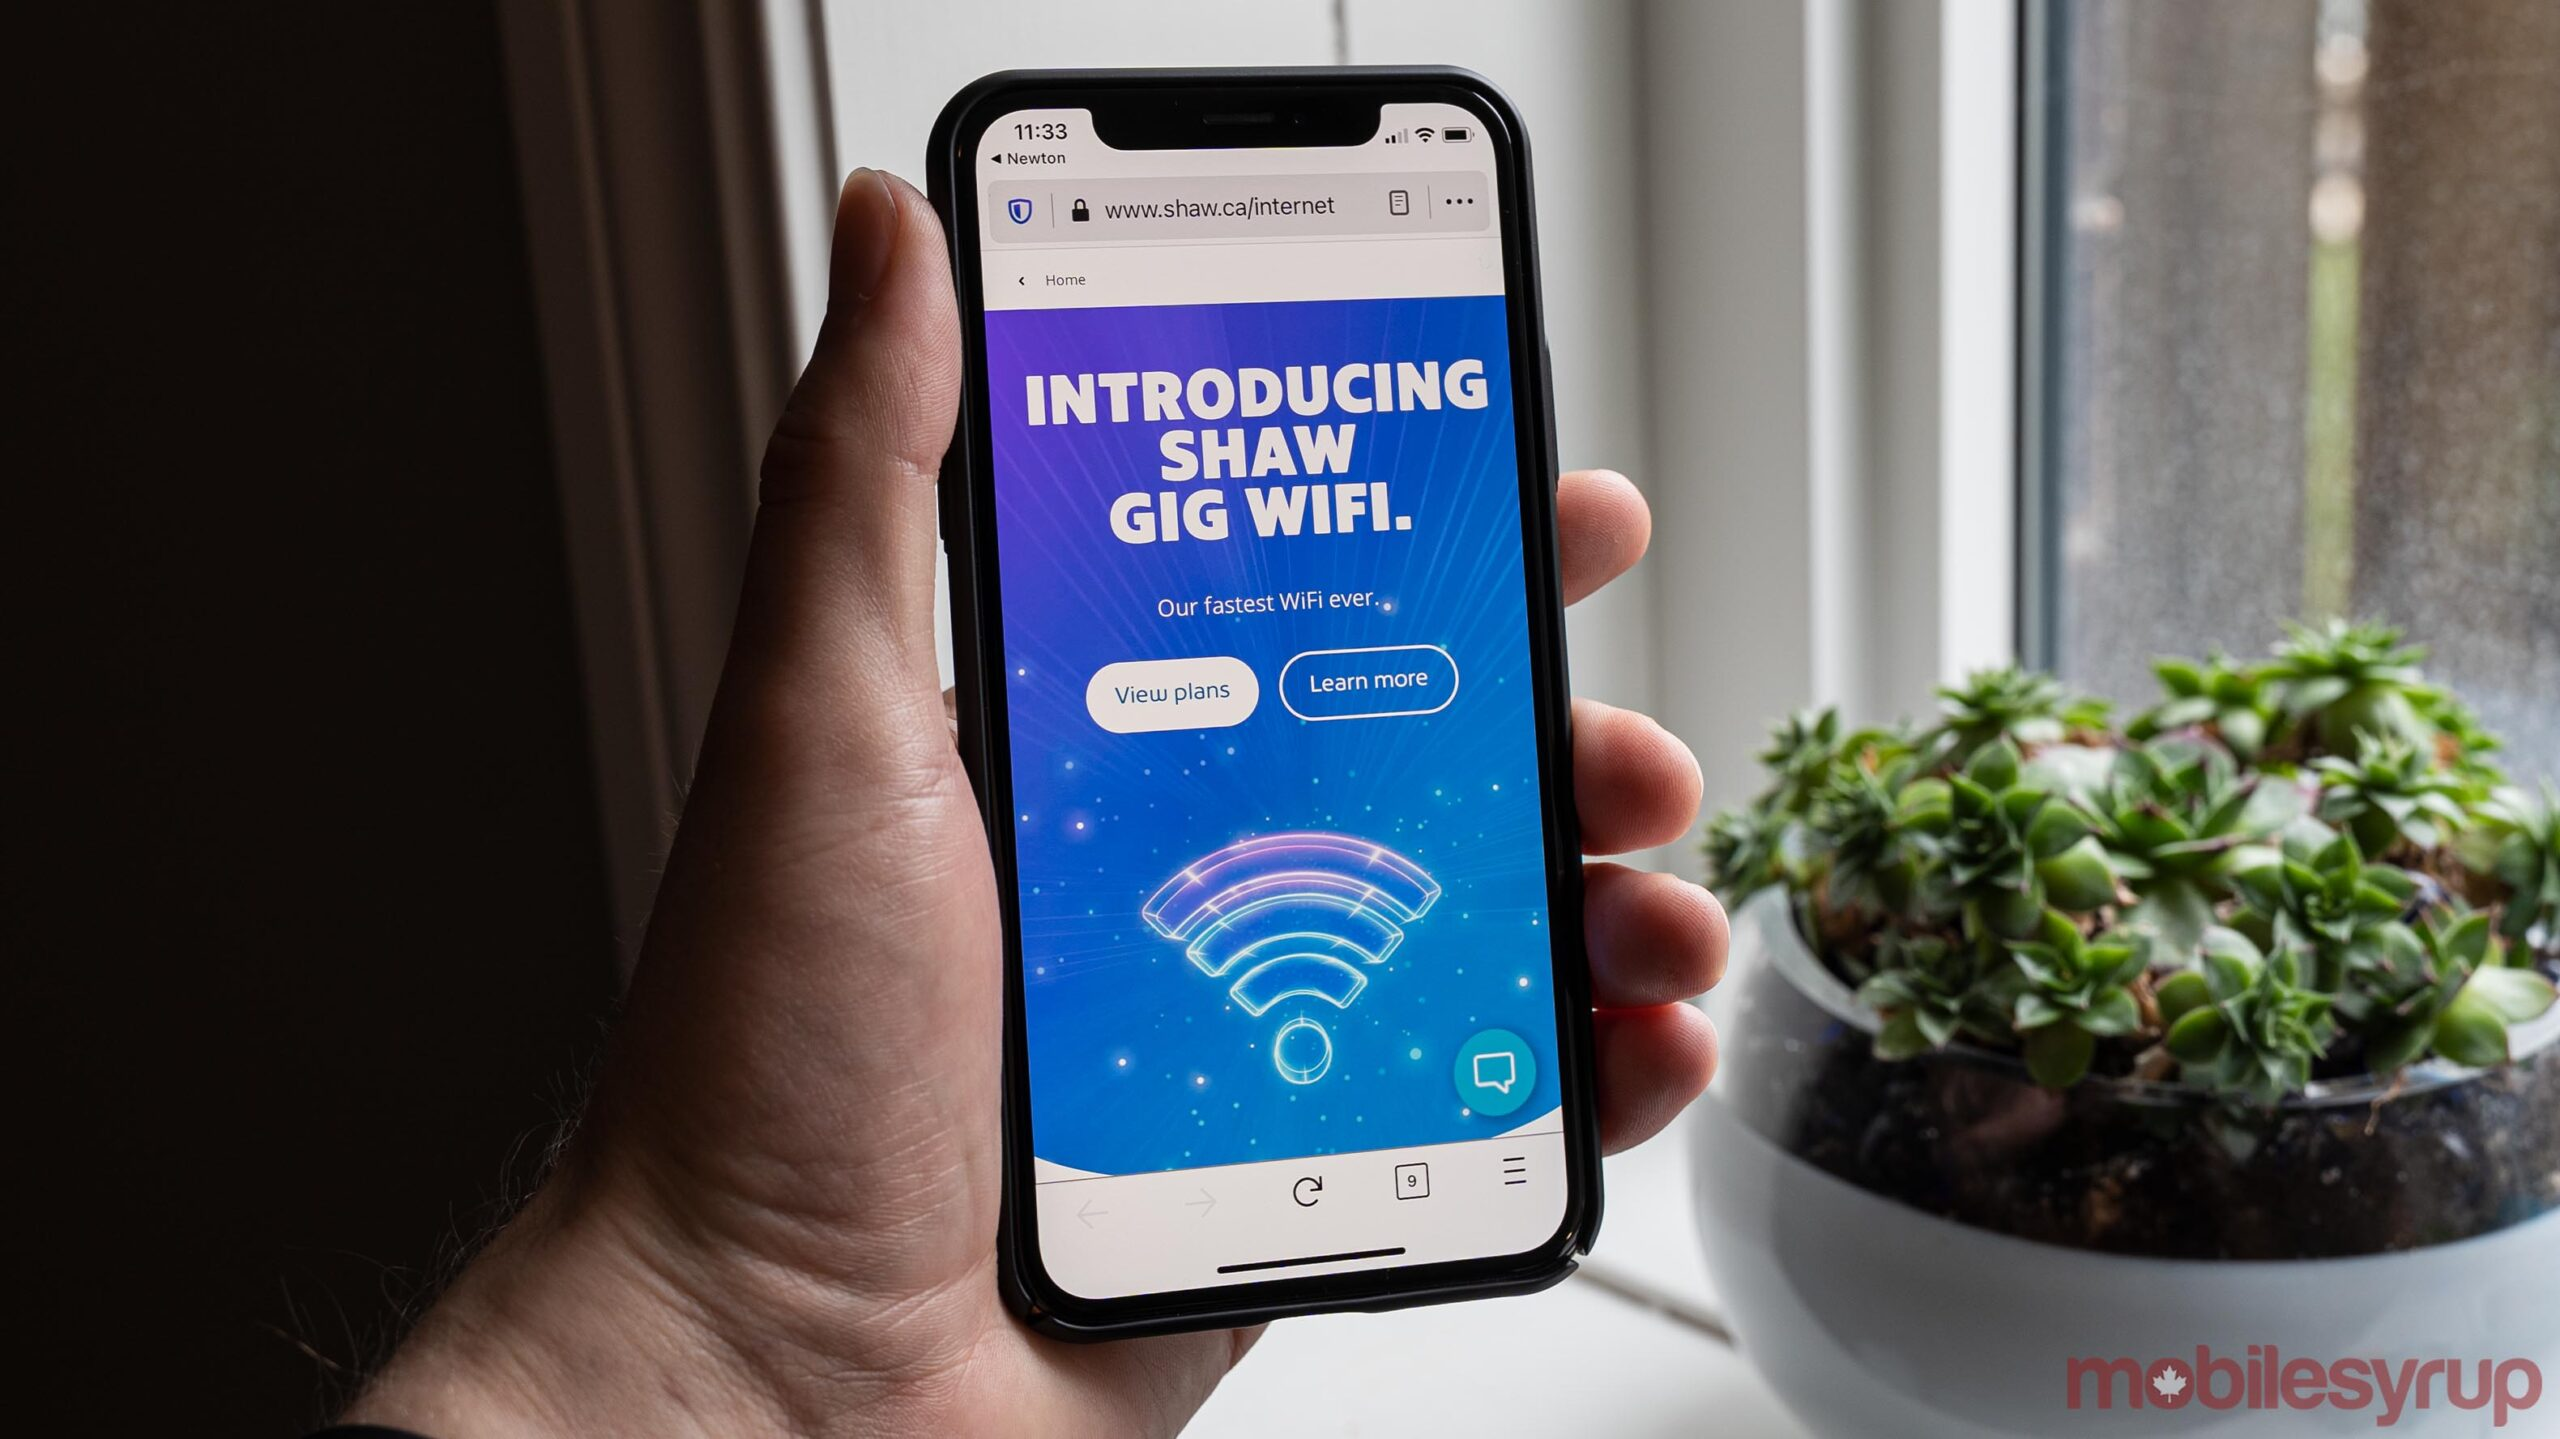 Shaw Gig Wifi website on mobile